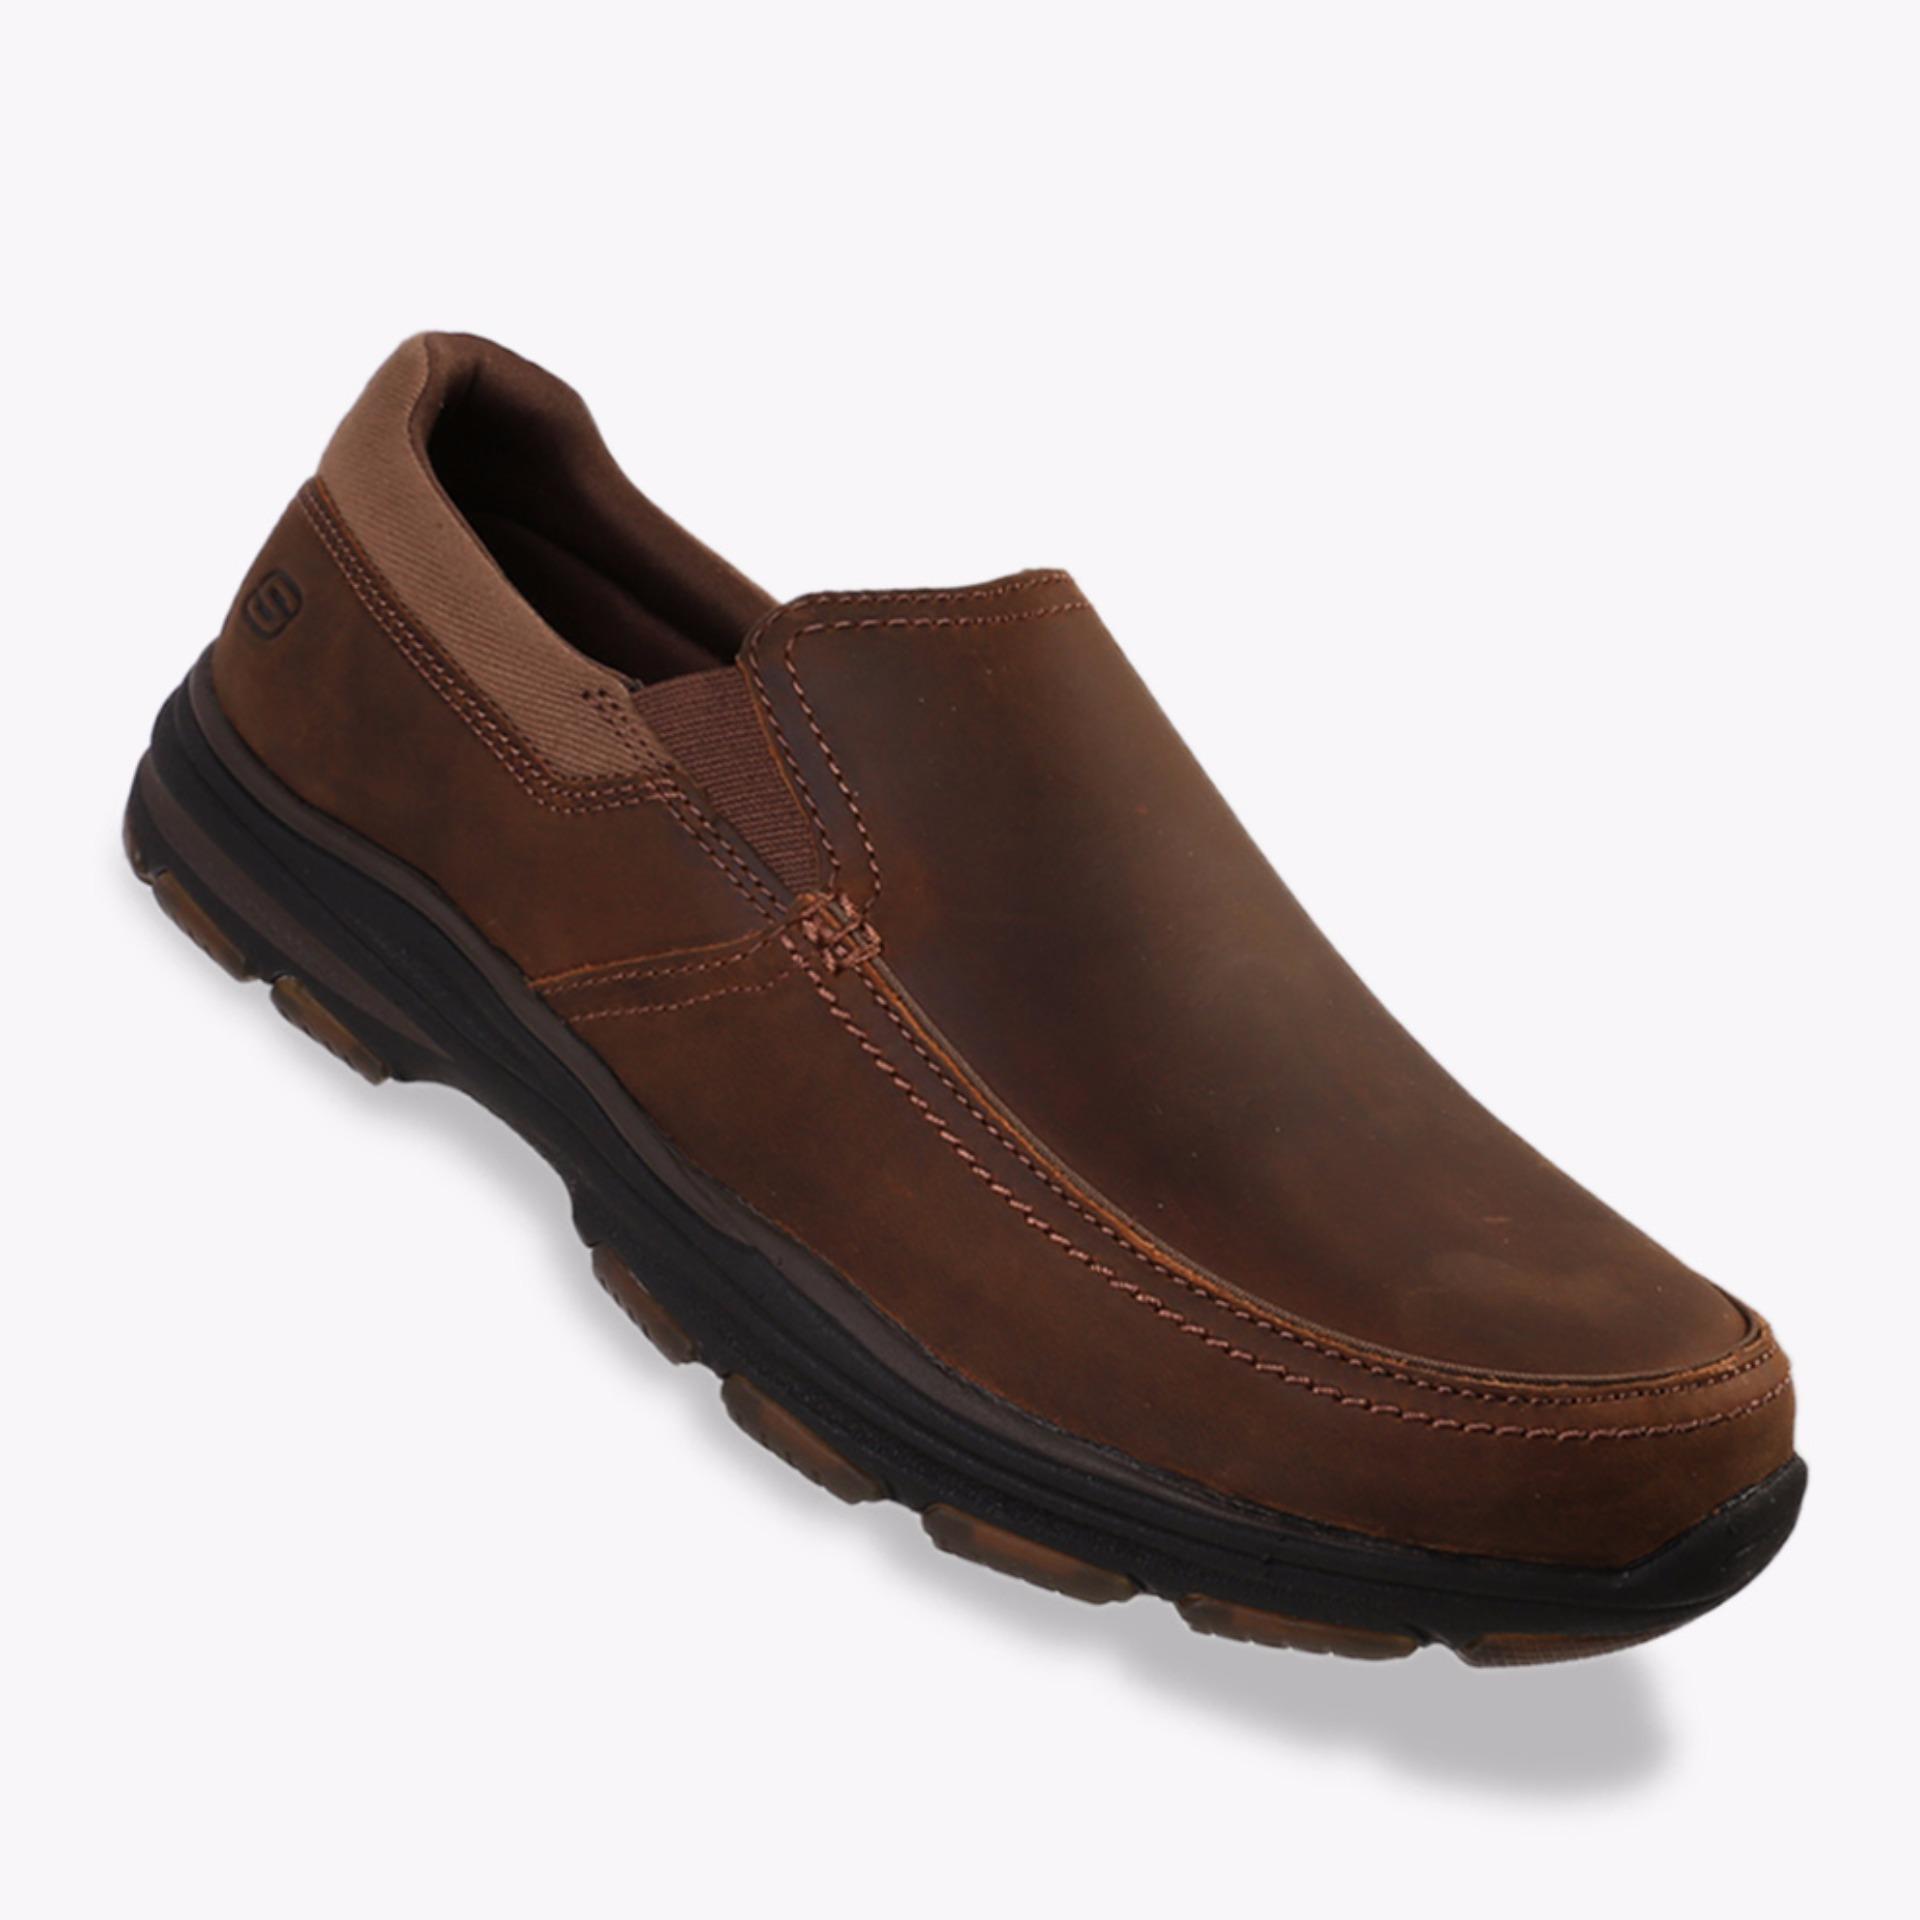 Harga Skechers Garton Venco Men S Casual Shoes Cokelat Asli Skechers